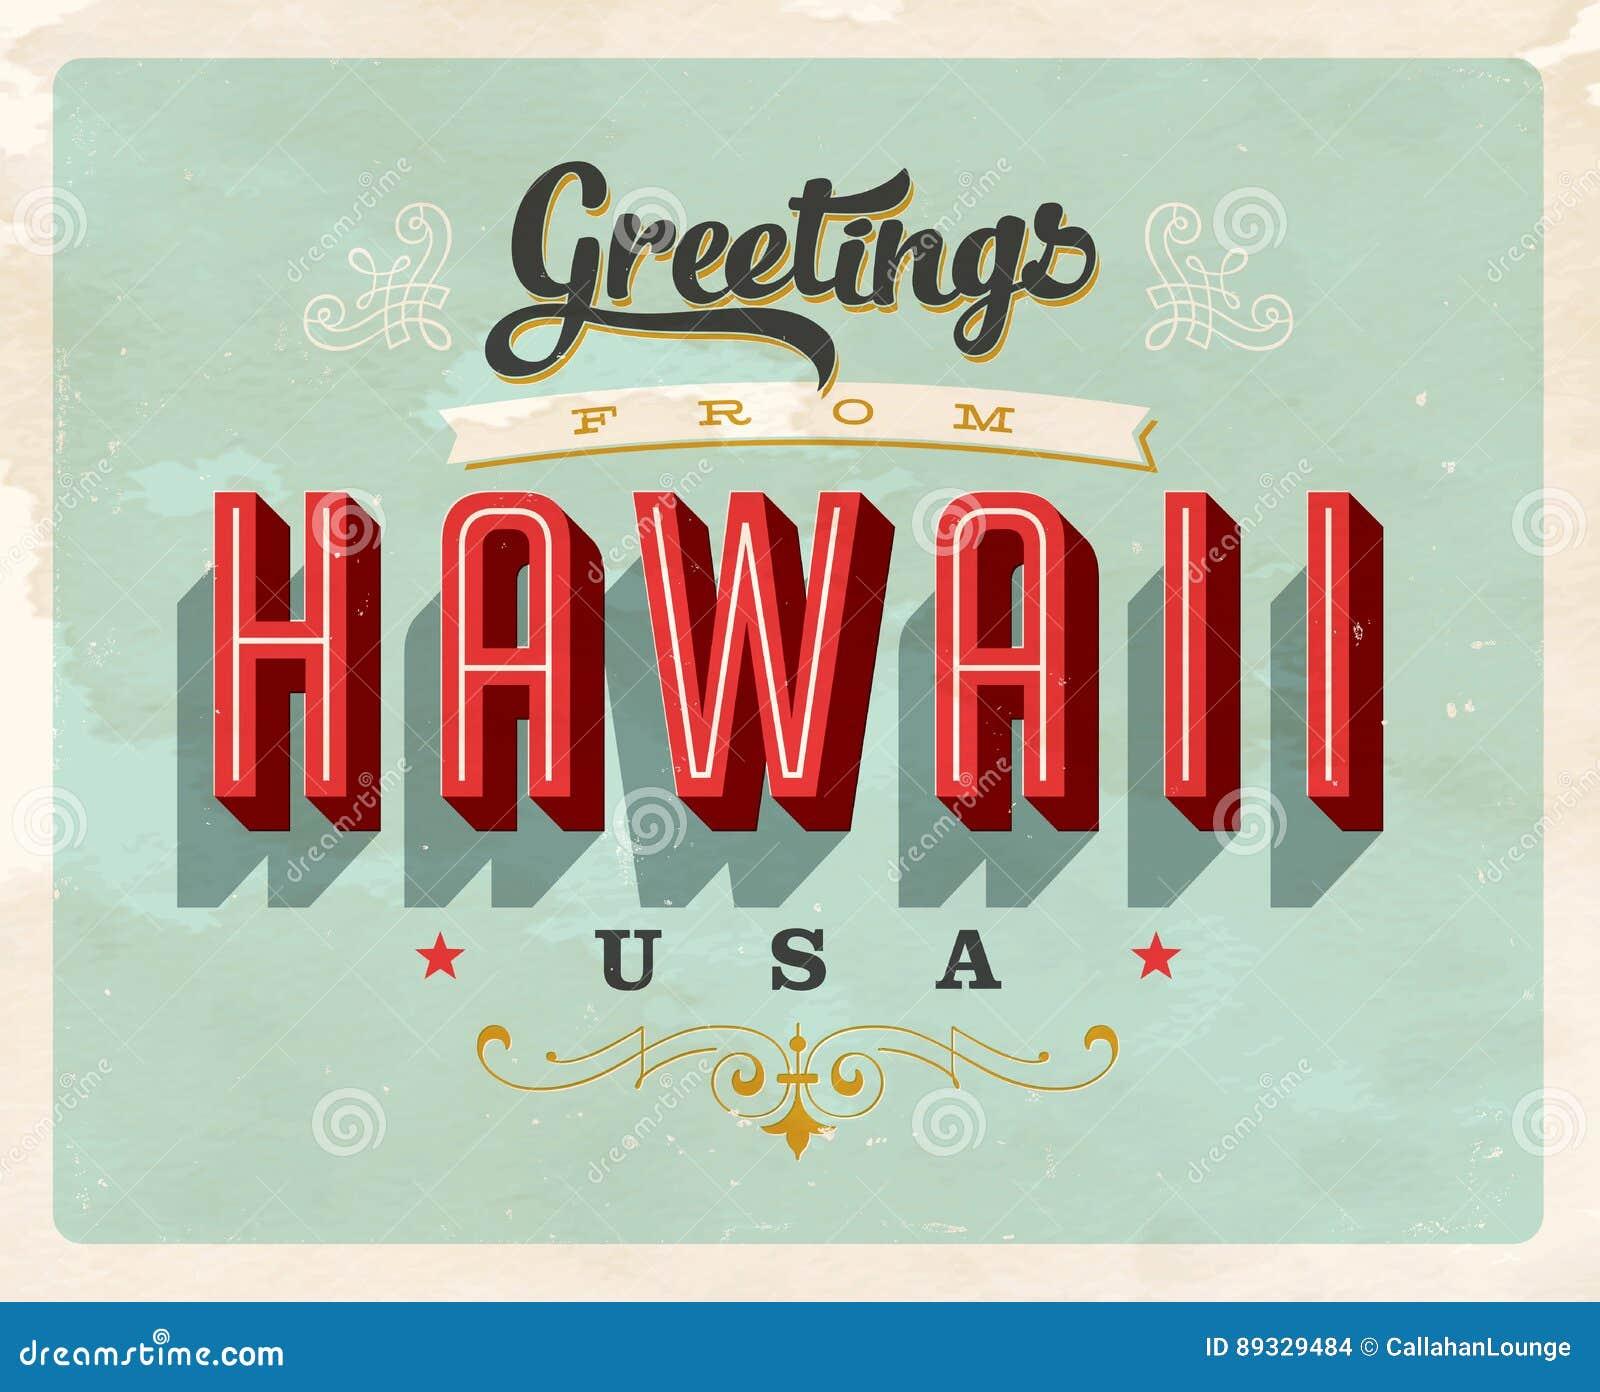 Vintage greetings from hawaii vacation card stock vector vintage greetings from hawaii vacation card kristyandbryce Choice Image